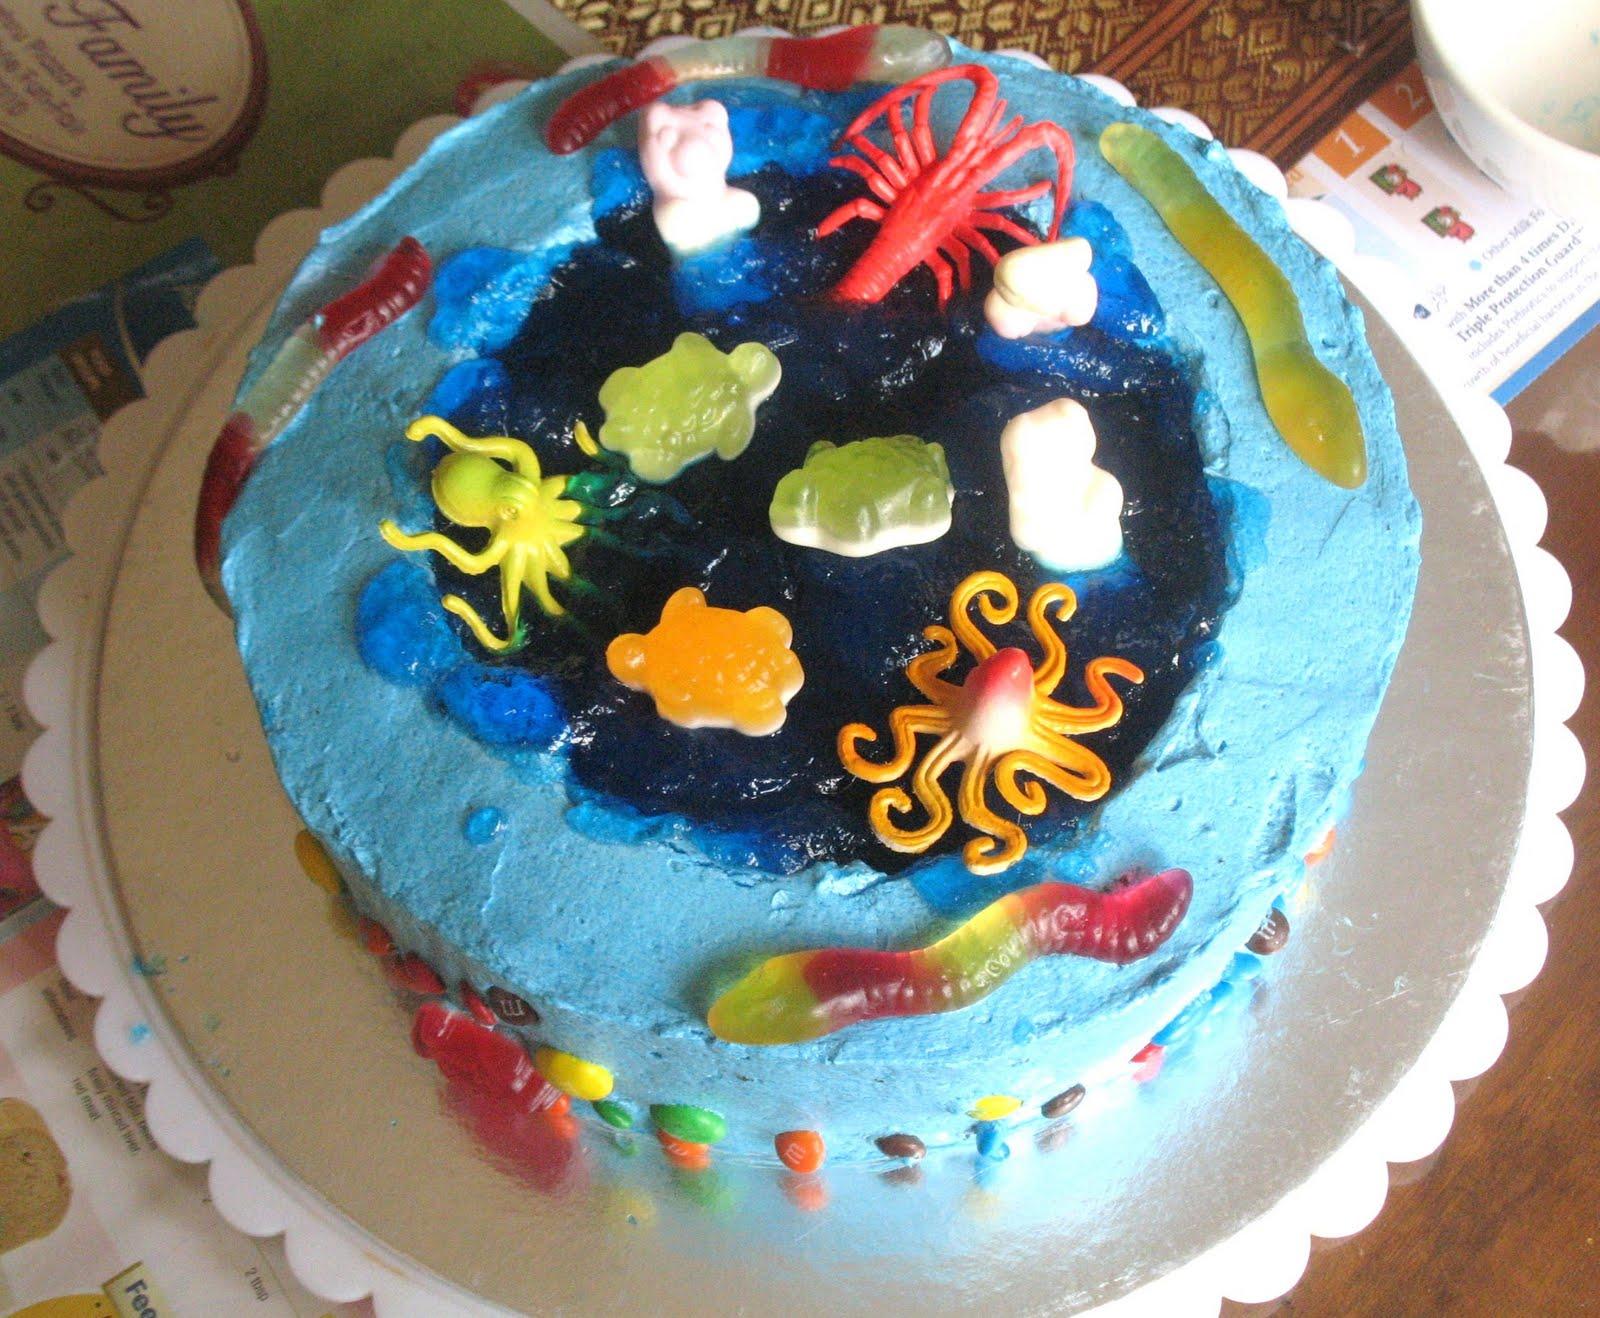 5 Loaves 2 Fish Under The Sea Birthday Cake